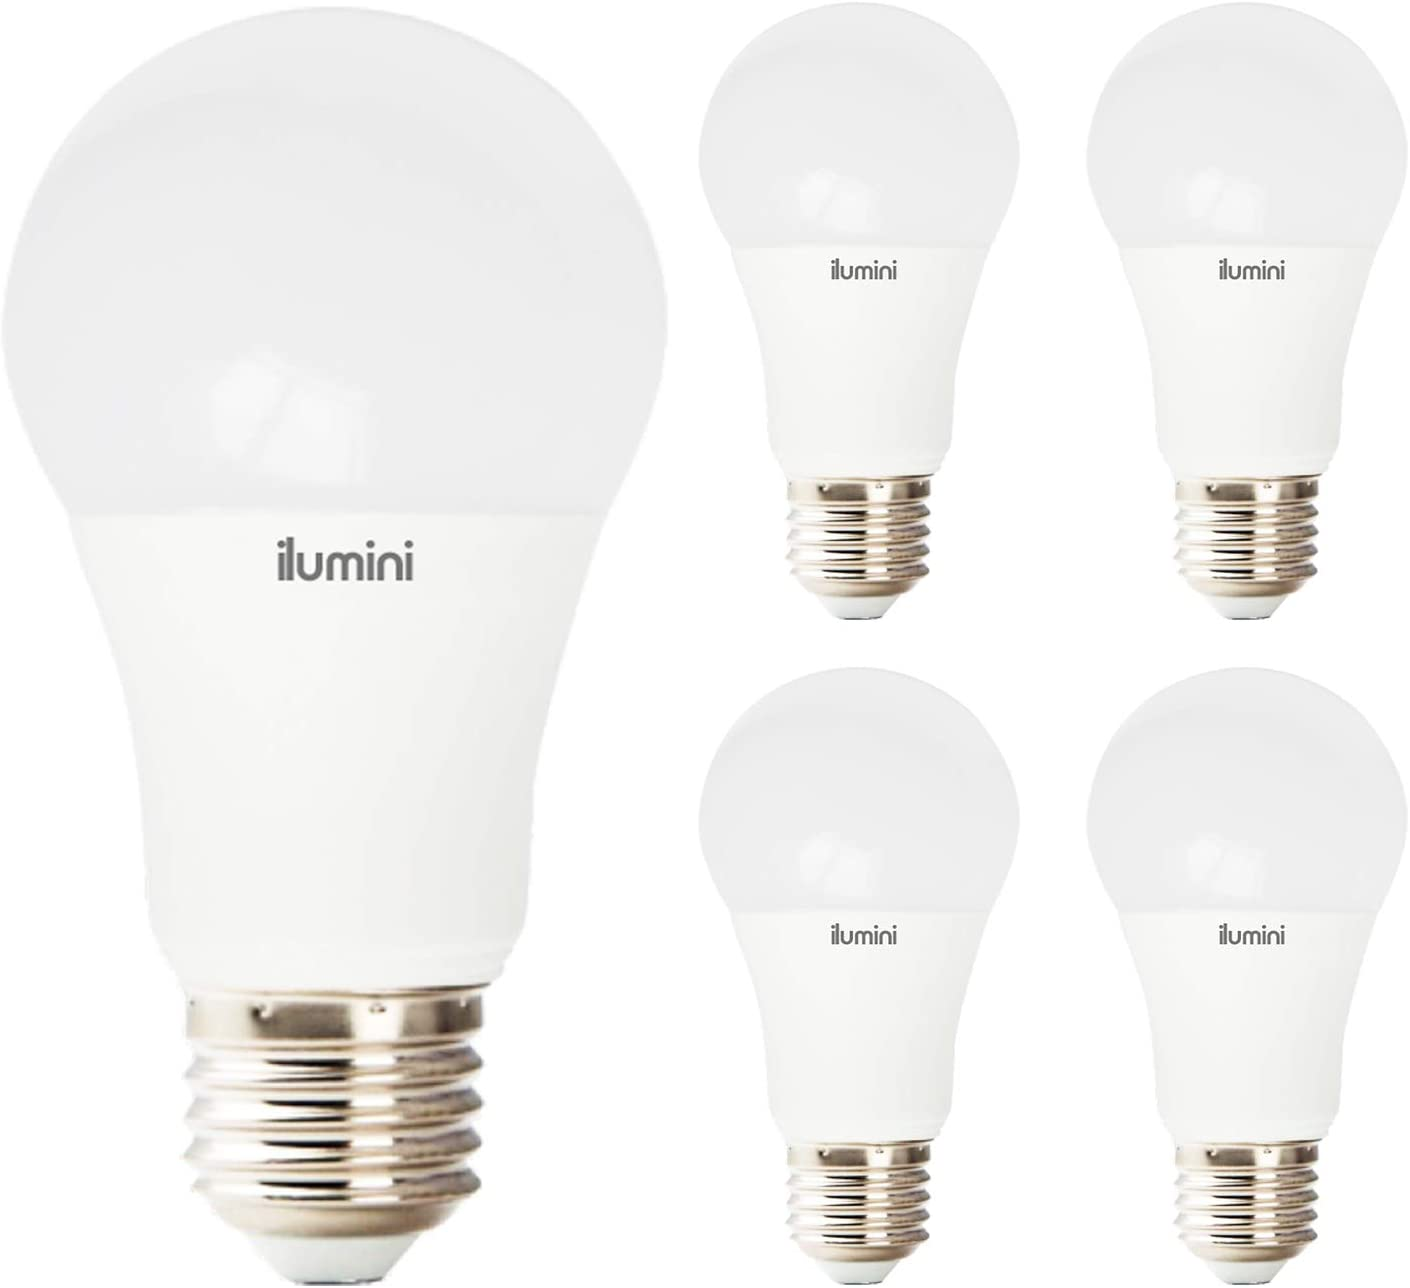 ILUMINI Bombillas LED A60 Estandár, Casquillo E27,10W equivalente a 70w, 3000K Luz Cálida, 950 Lúmenes [Clase de eficiencia energética A+] PACK DE 5